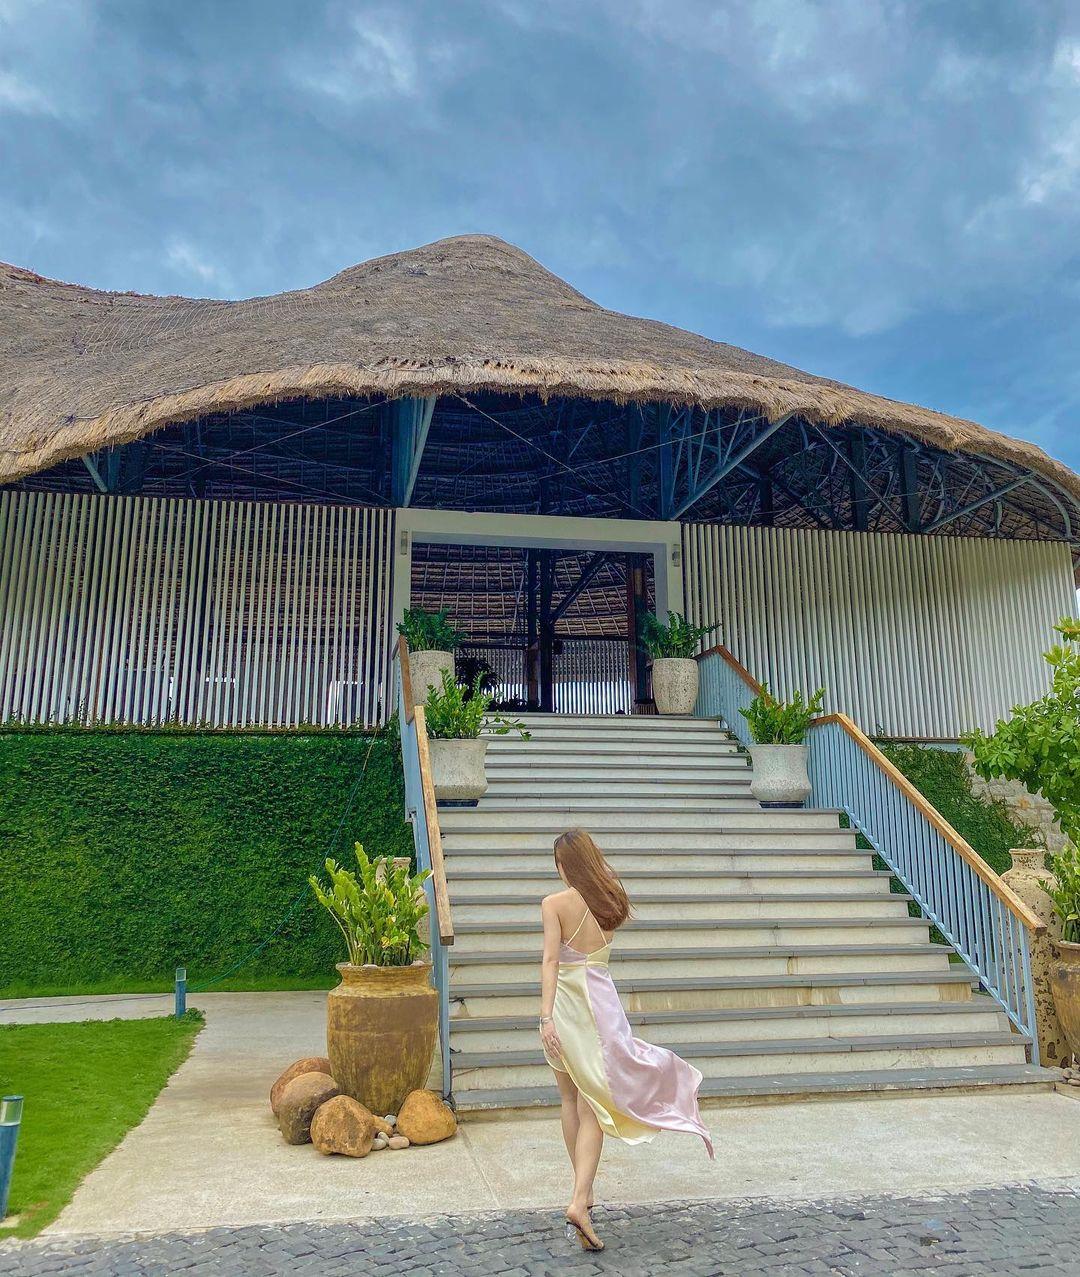 Thatched bungalow at Casa Marina resort Quy Nhon, Vietnam